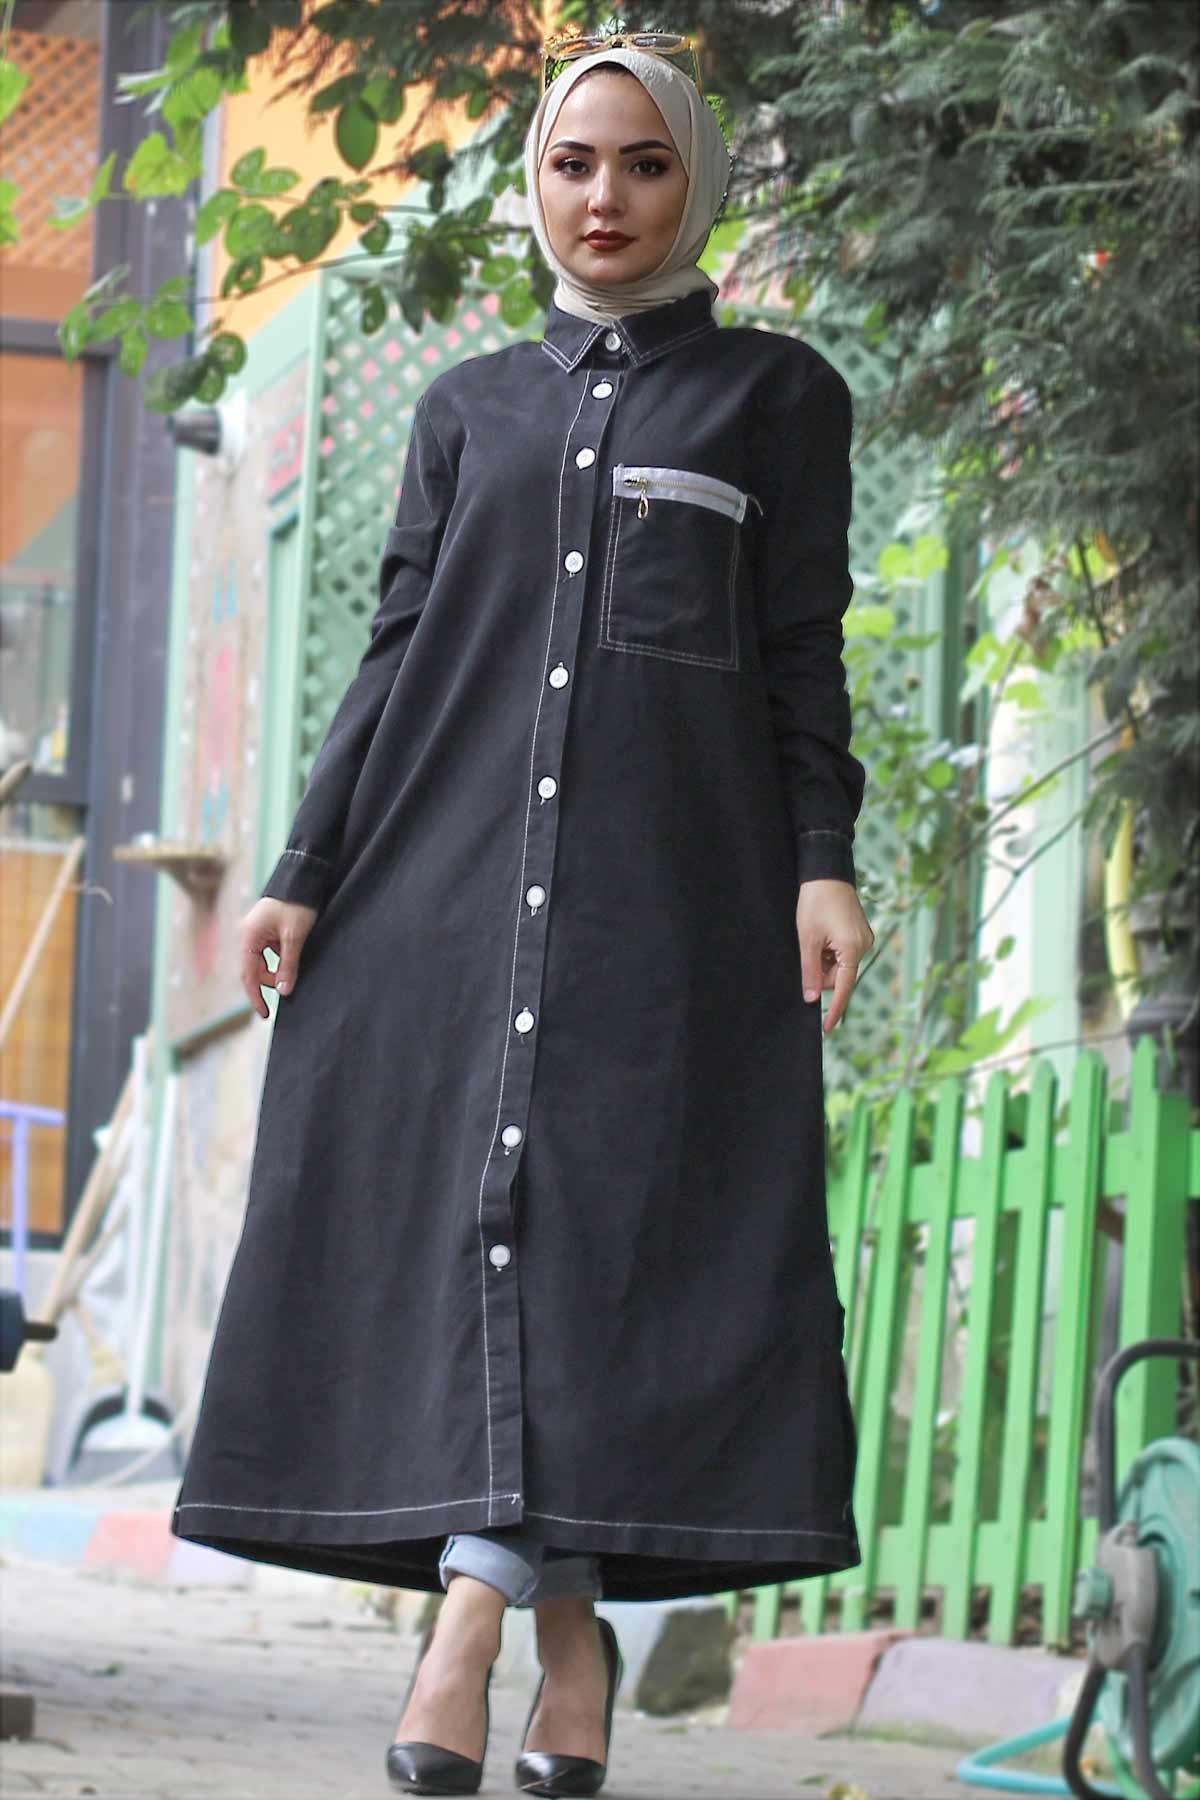 Ornamental Pocket Jeans Cape TSD4135 Black